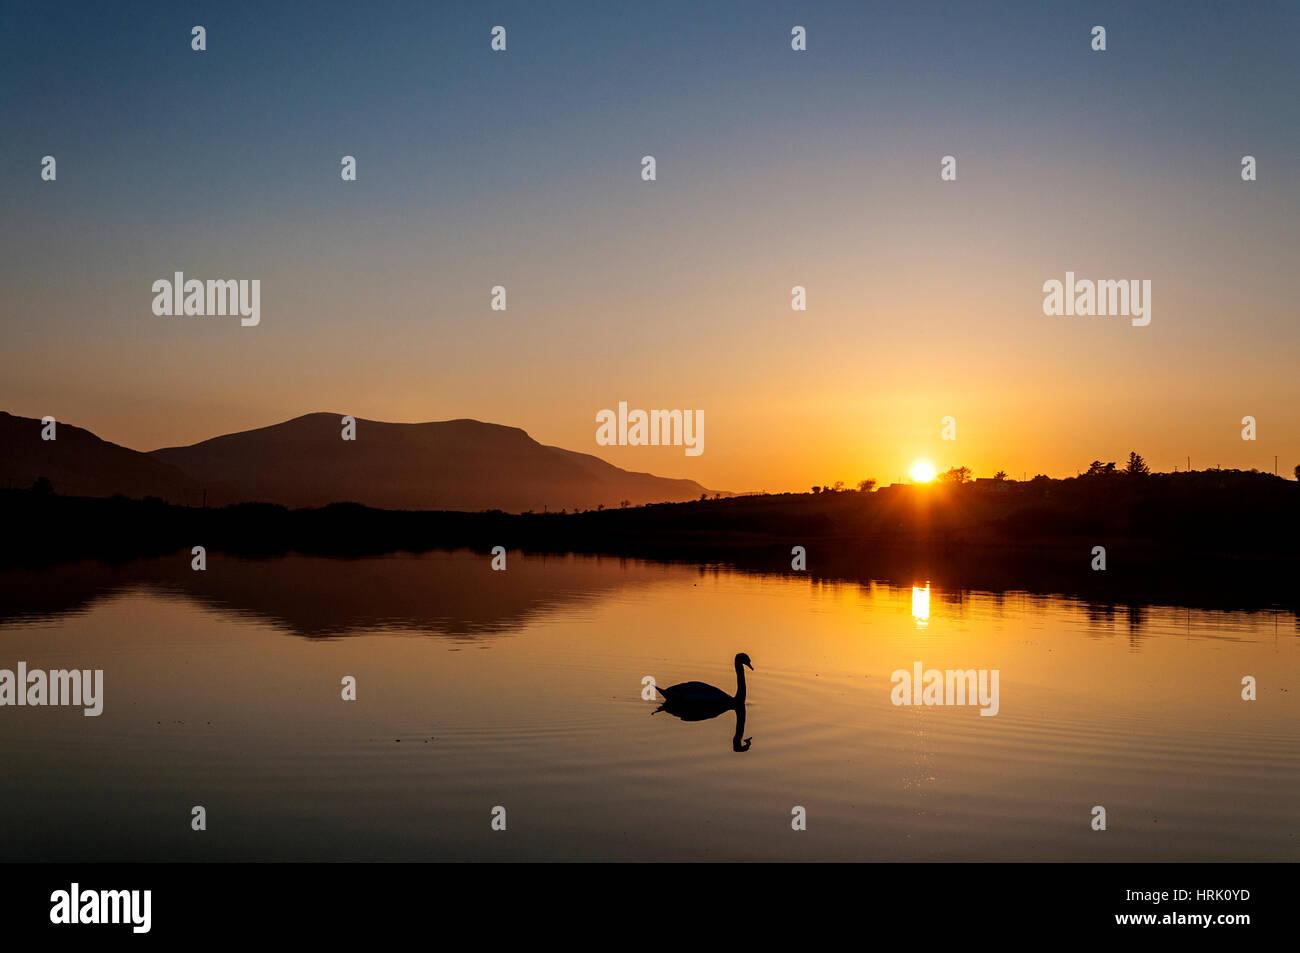 Calma tranquilo lago con cisnes al atardecer Imagen De Stock